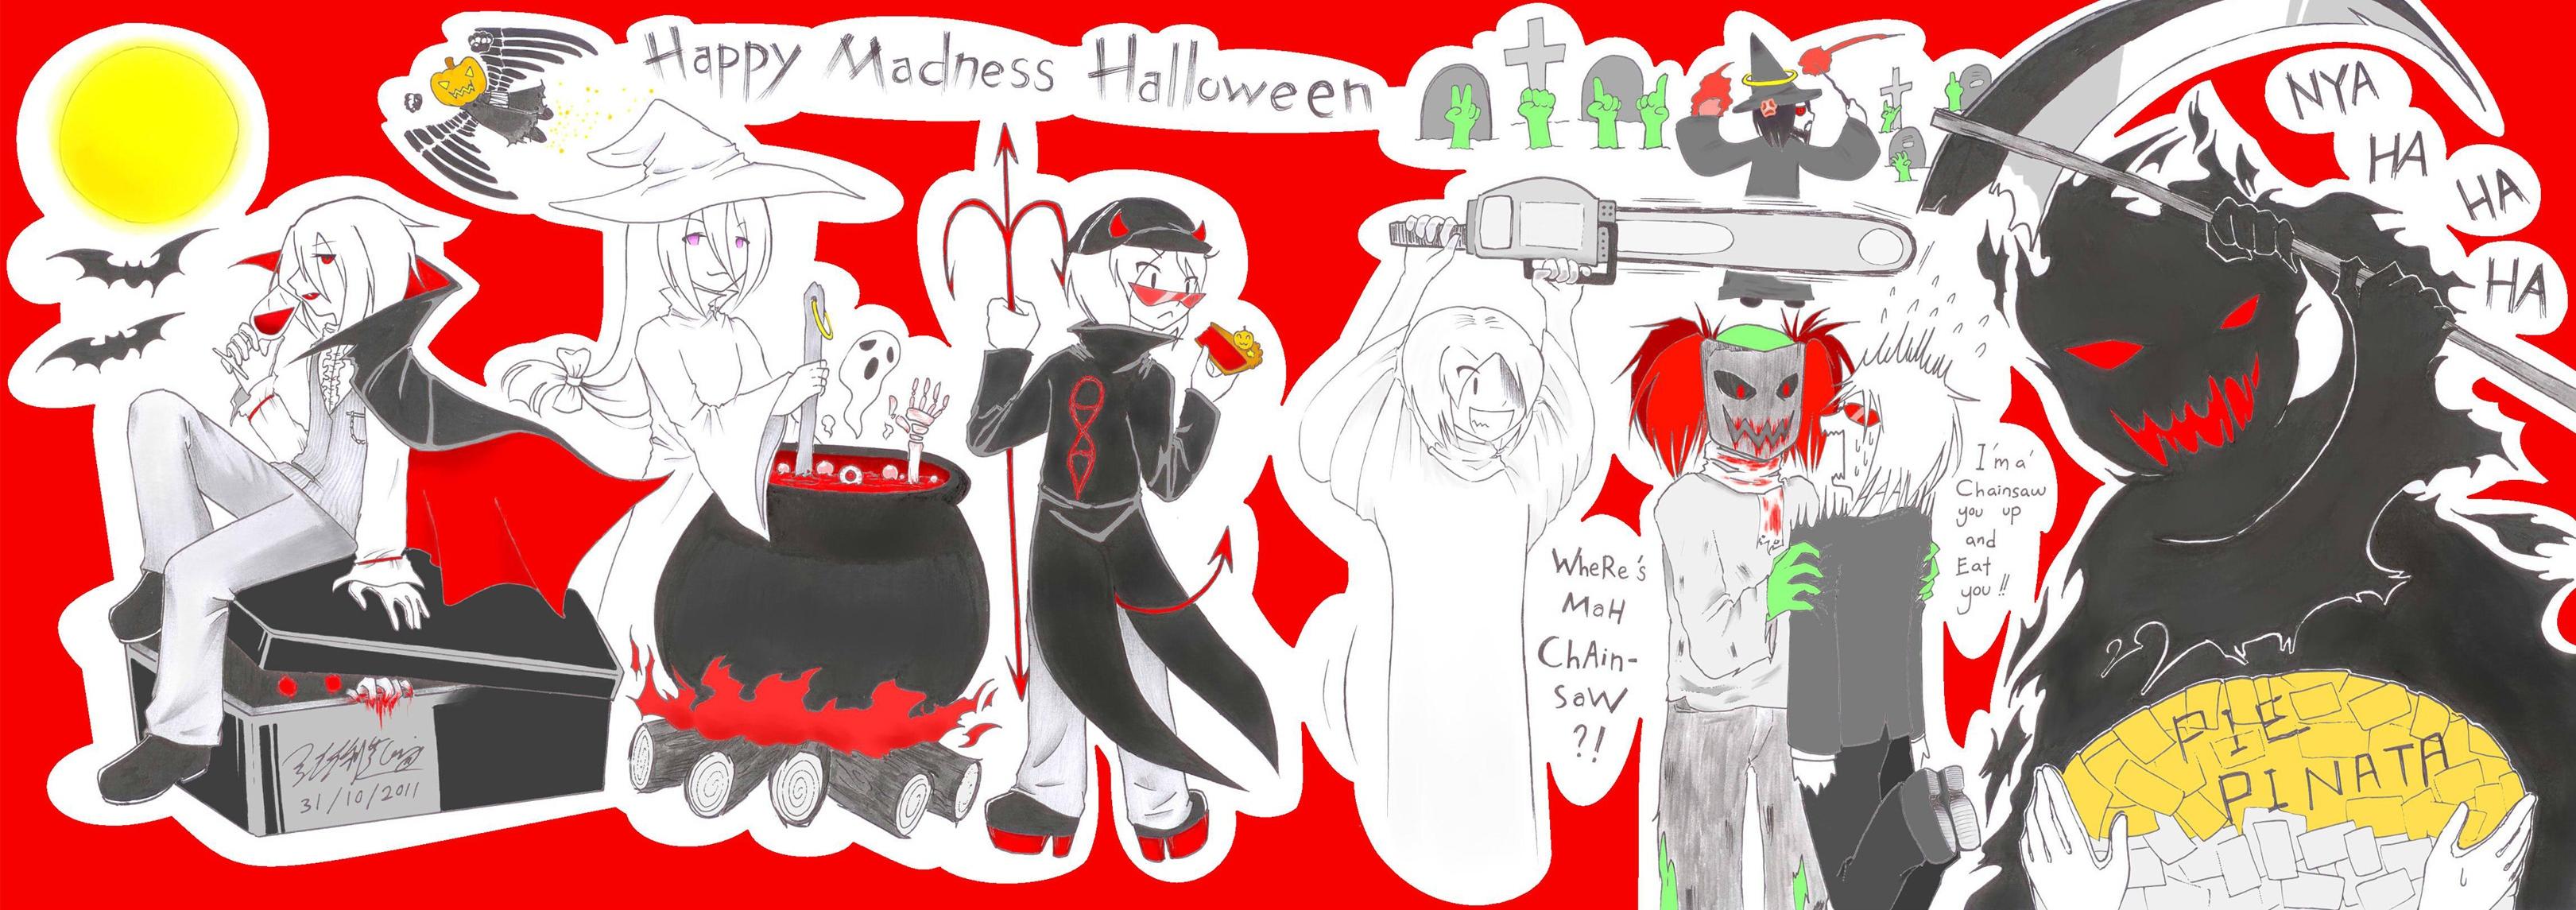 Madness Halloween